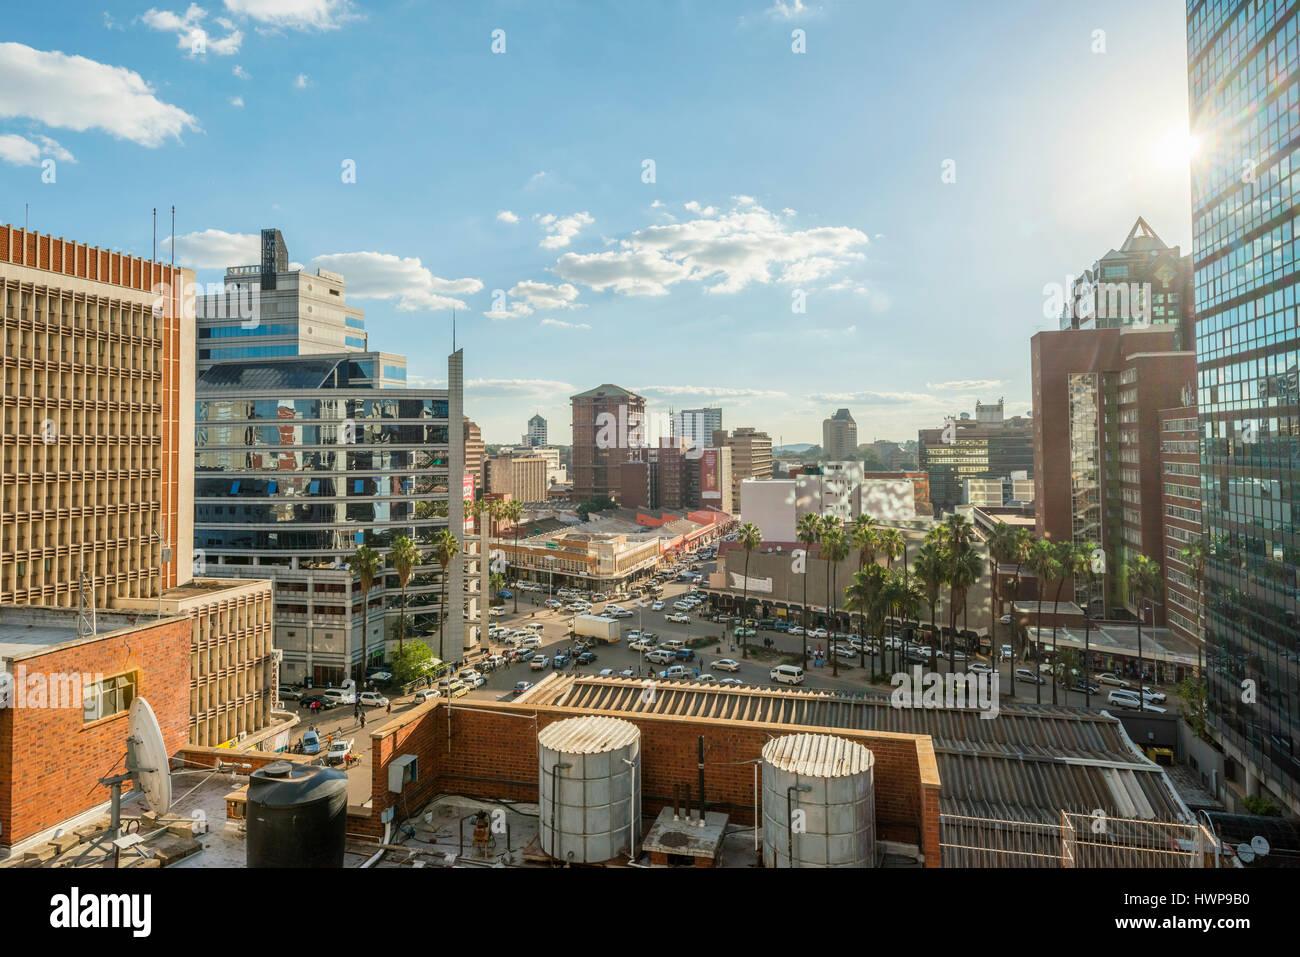 Zimbabwe Harare Capital City Stock Photos & Zimbabwe Harare